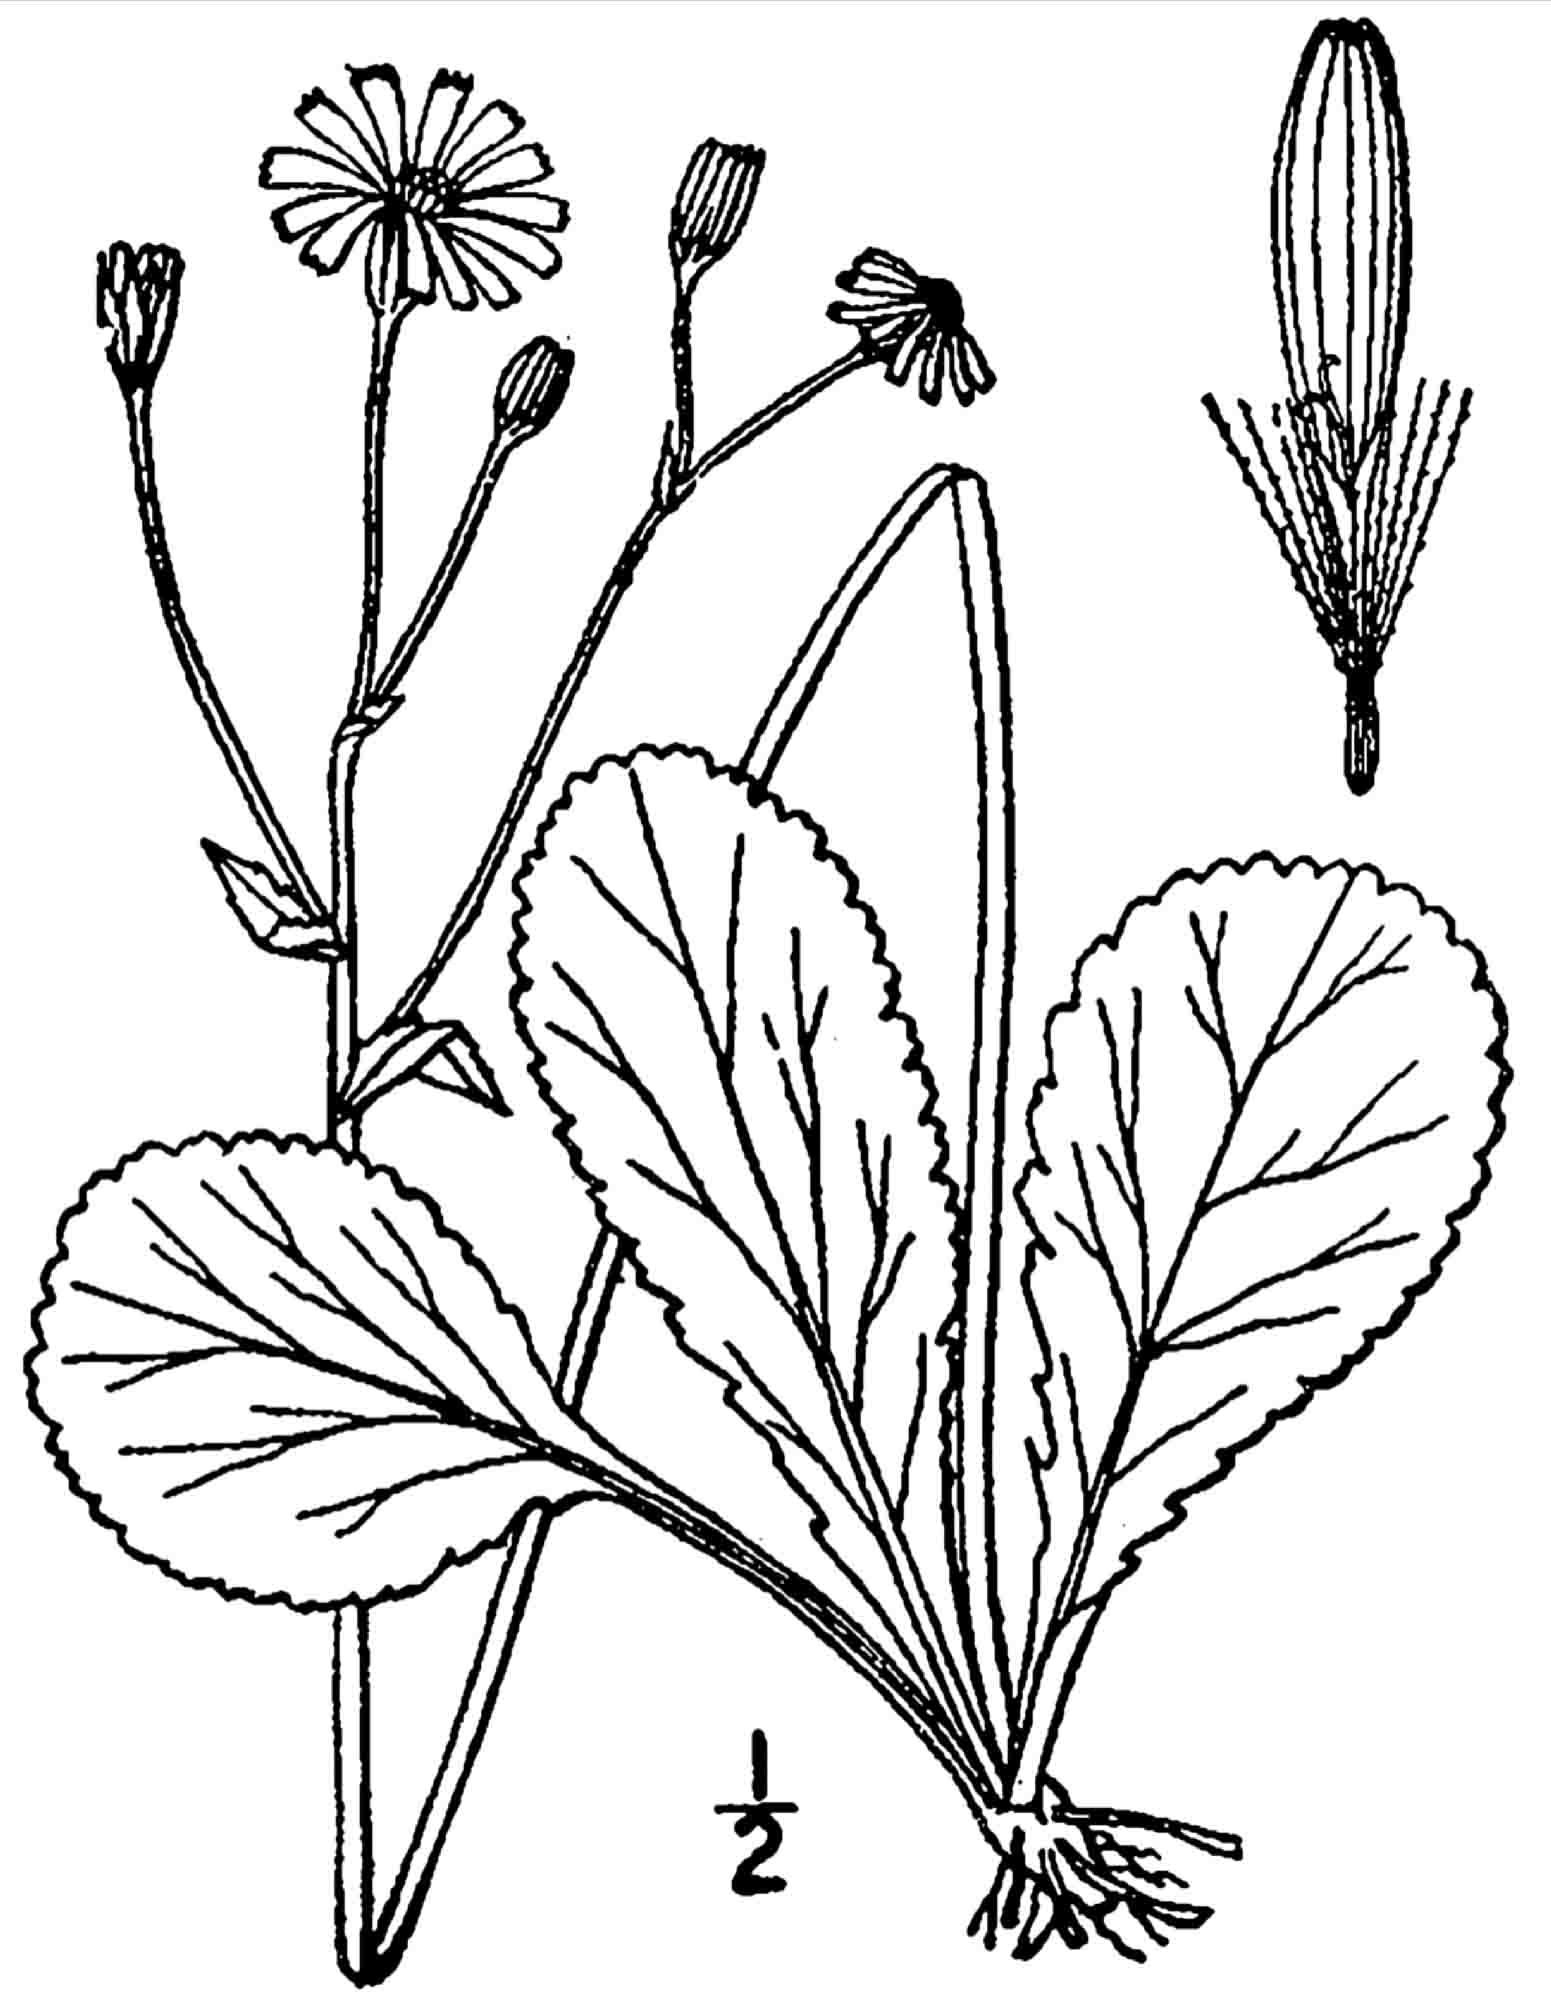 Senecio obovatus – Squaw Weed